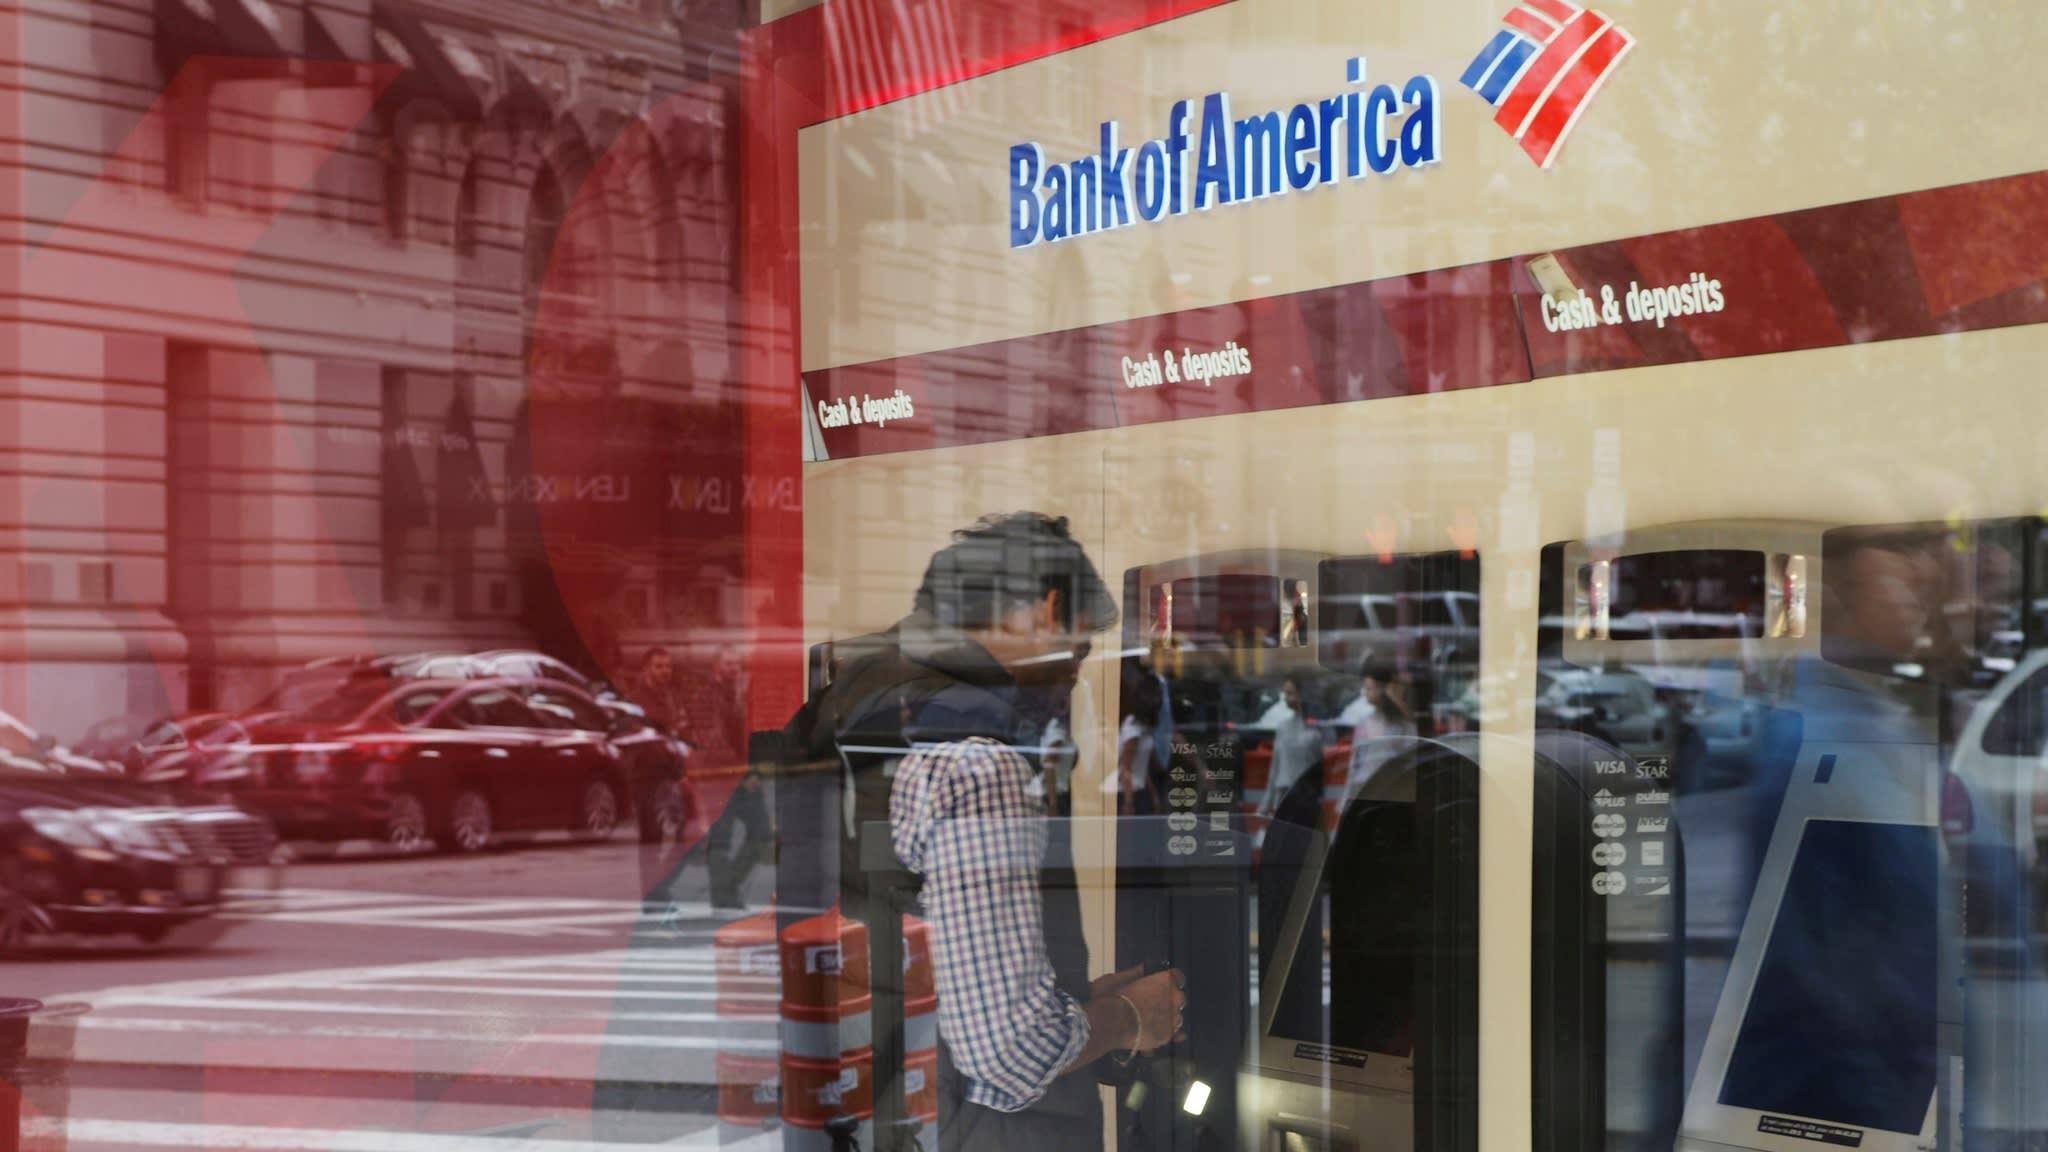 Bank of America profits jump as revenue falls less than feared